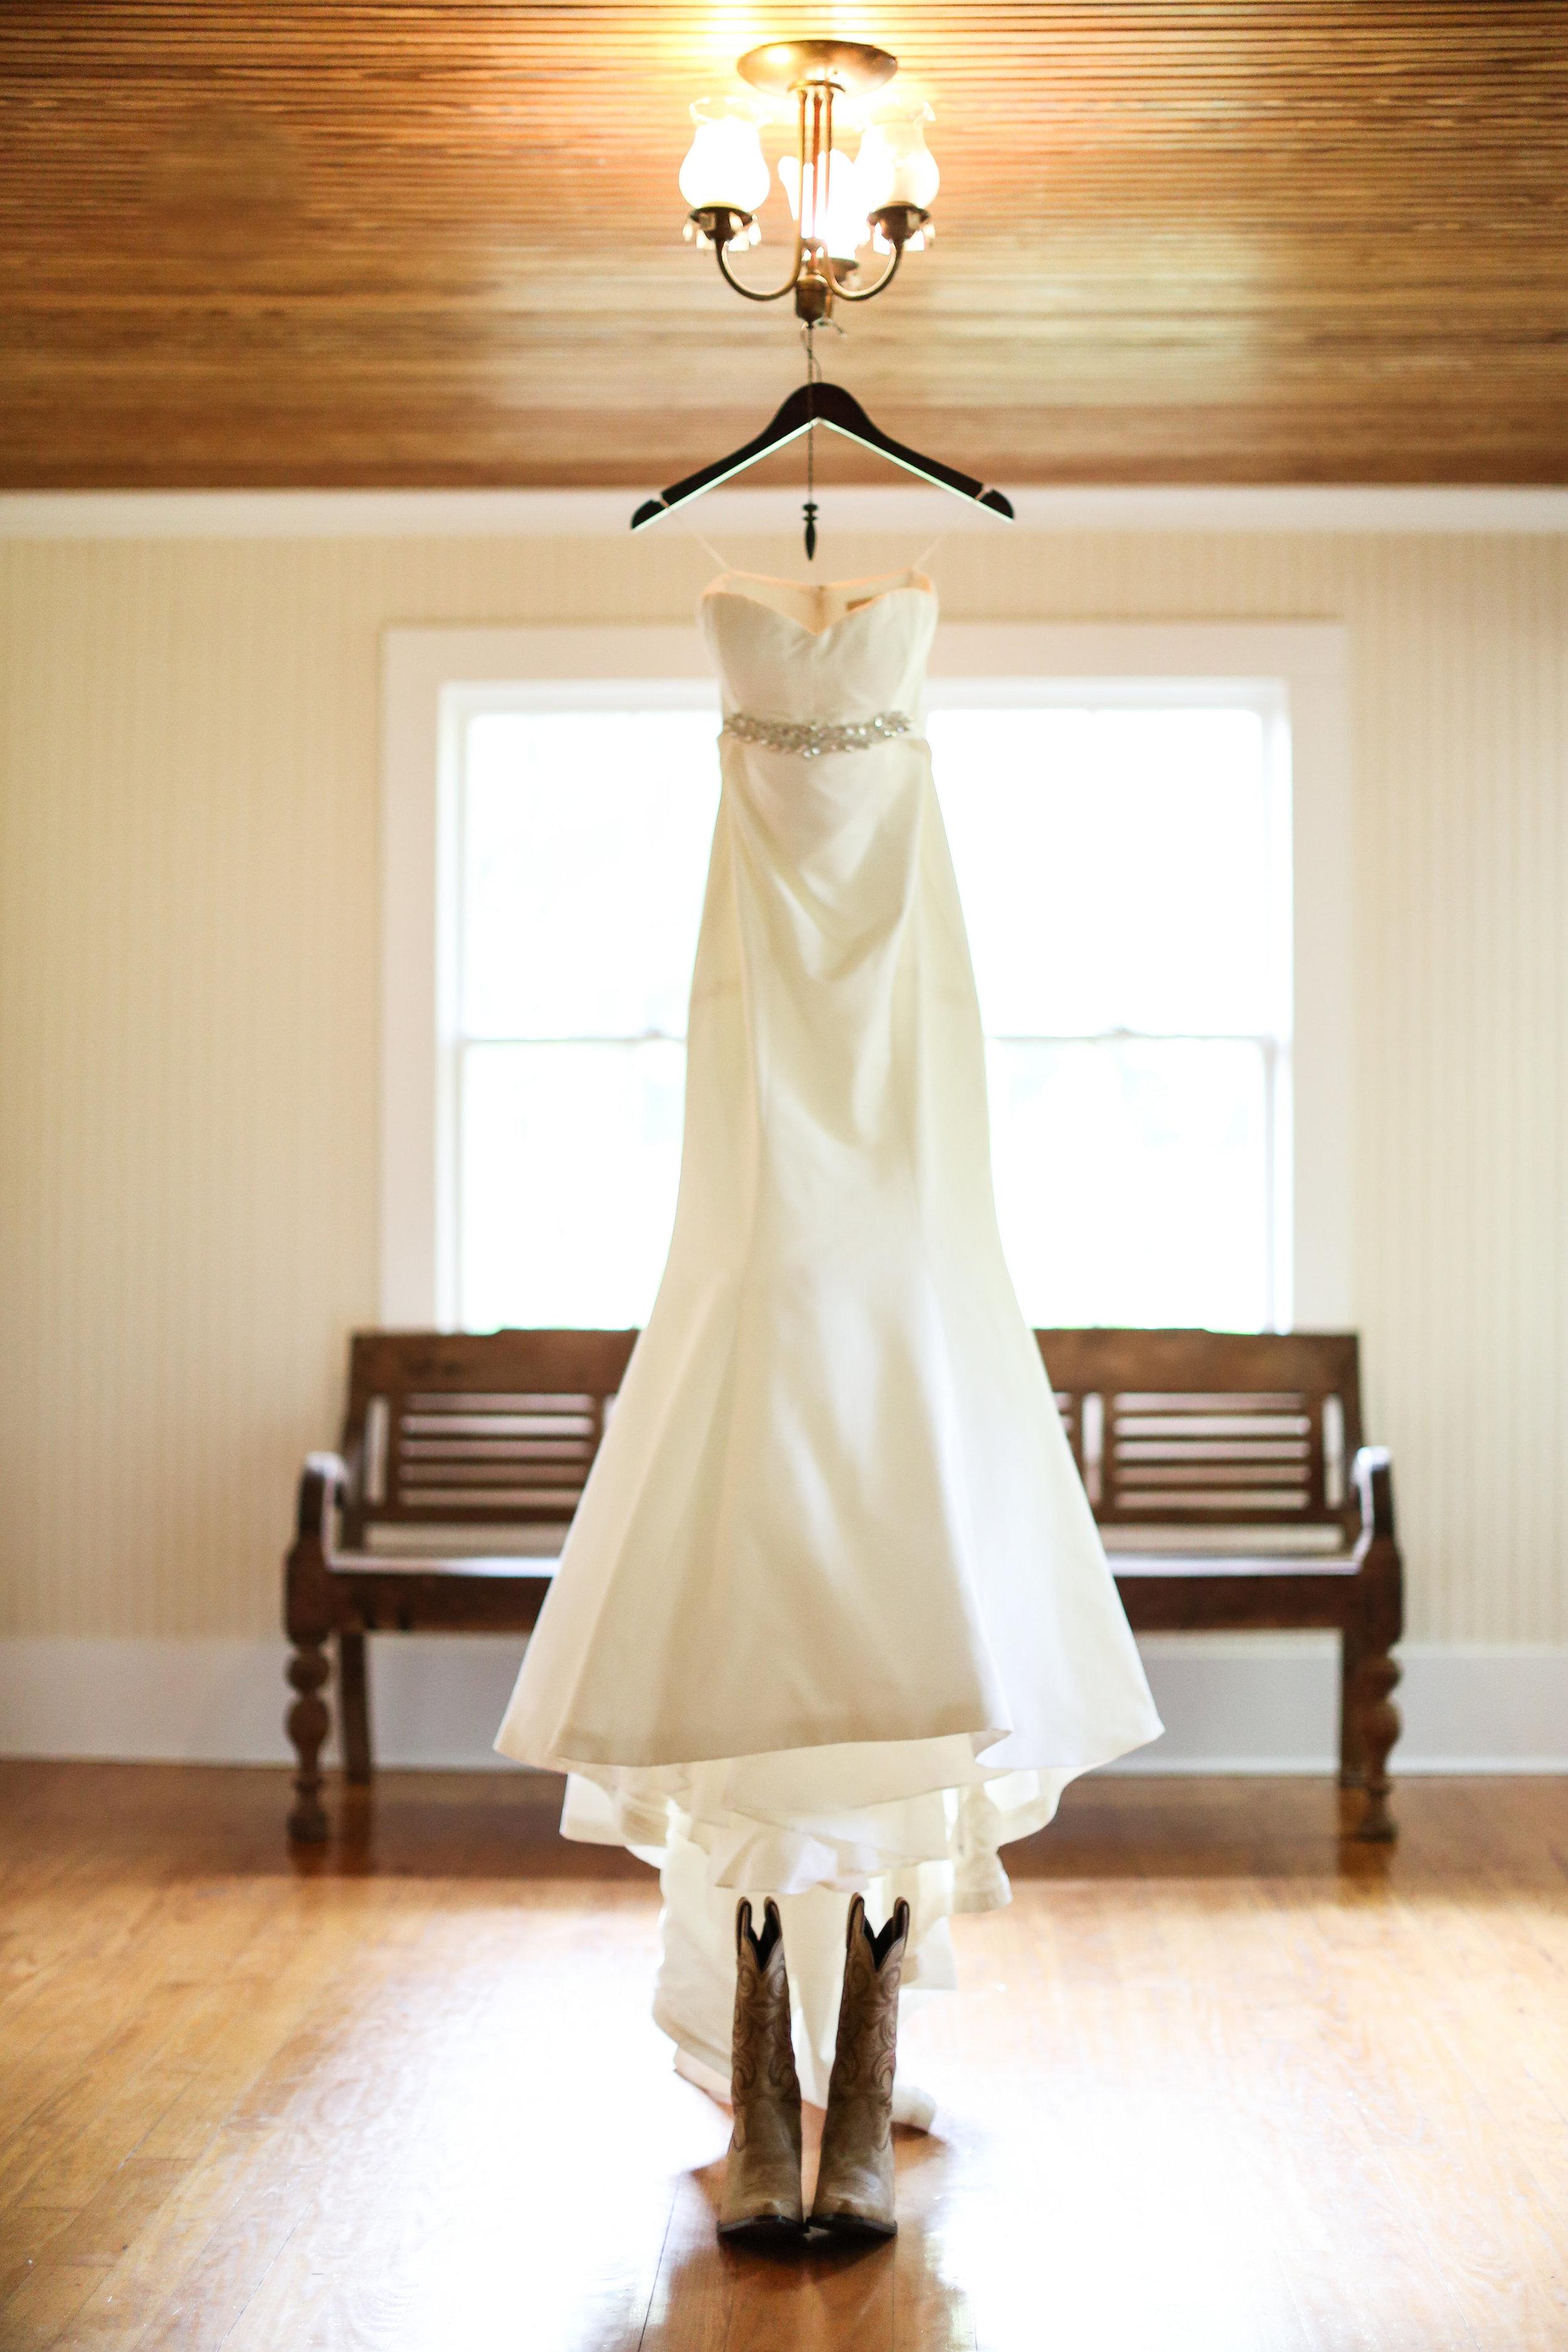 finnegan-photography-ivory-and-beau-bridal-boutique-nicole-miller-dakota-jaclyn-jordan-anne-veil-savannah-bridal-boutique-savannah-wedding-dresses-savannah-weddings-statesboro-wedding-barn-wedding-savannah-bridal-georgia-bridal-boutique-1.jpg